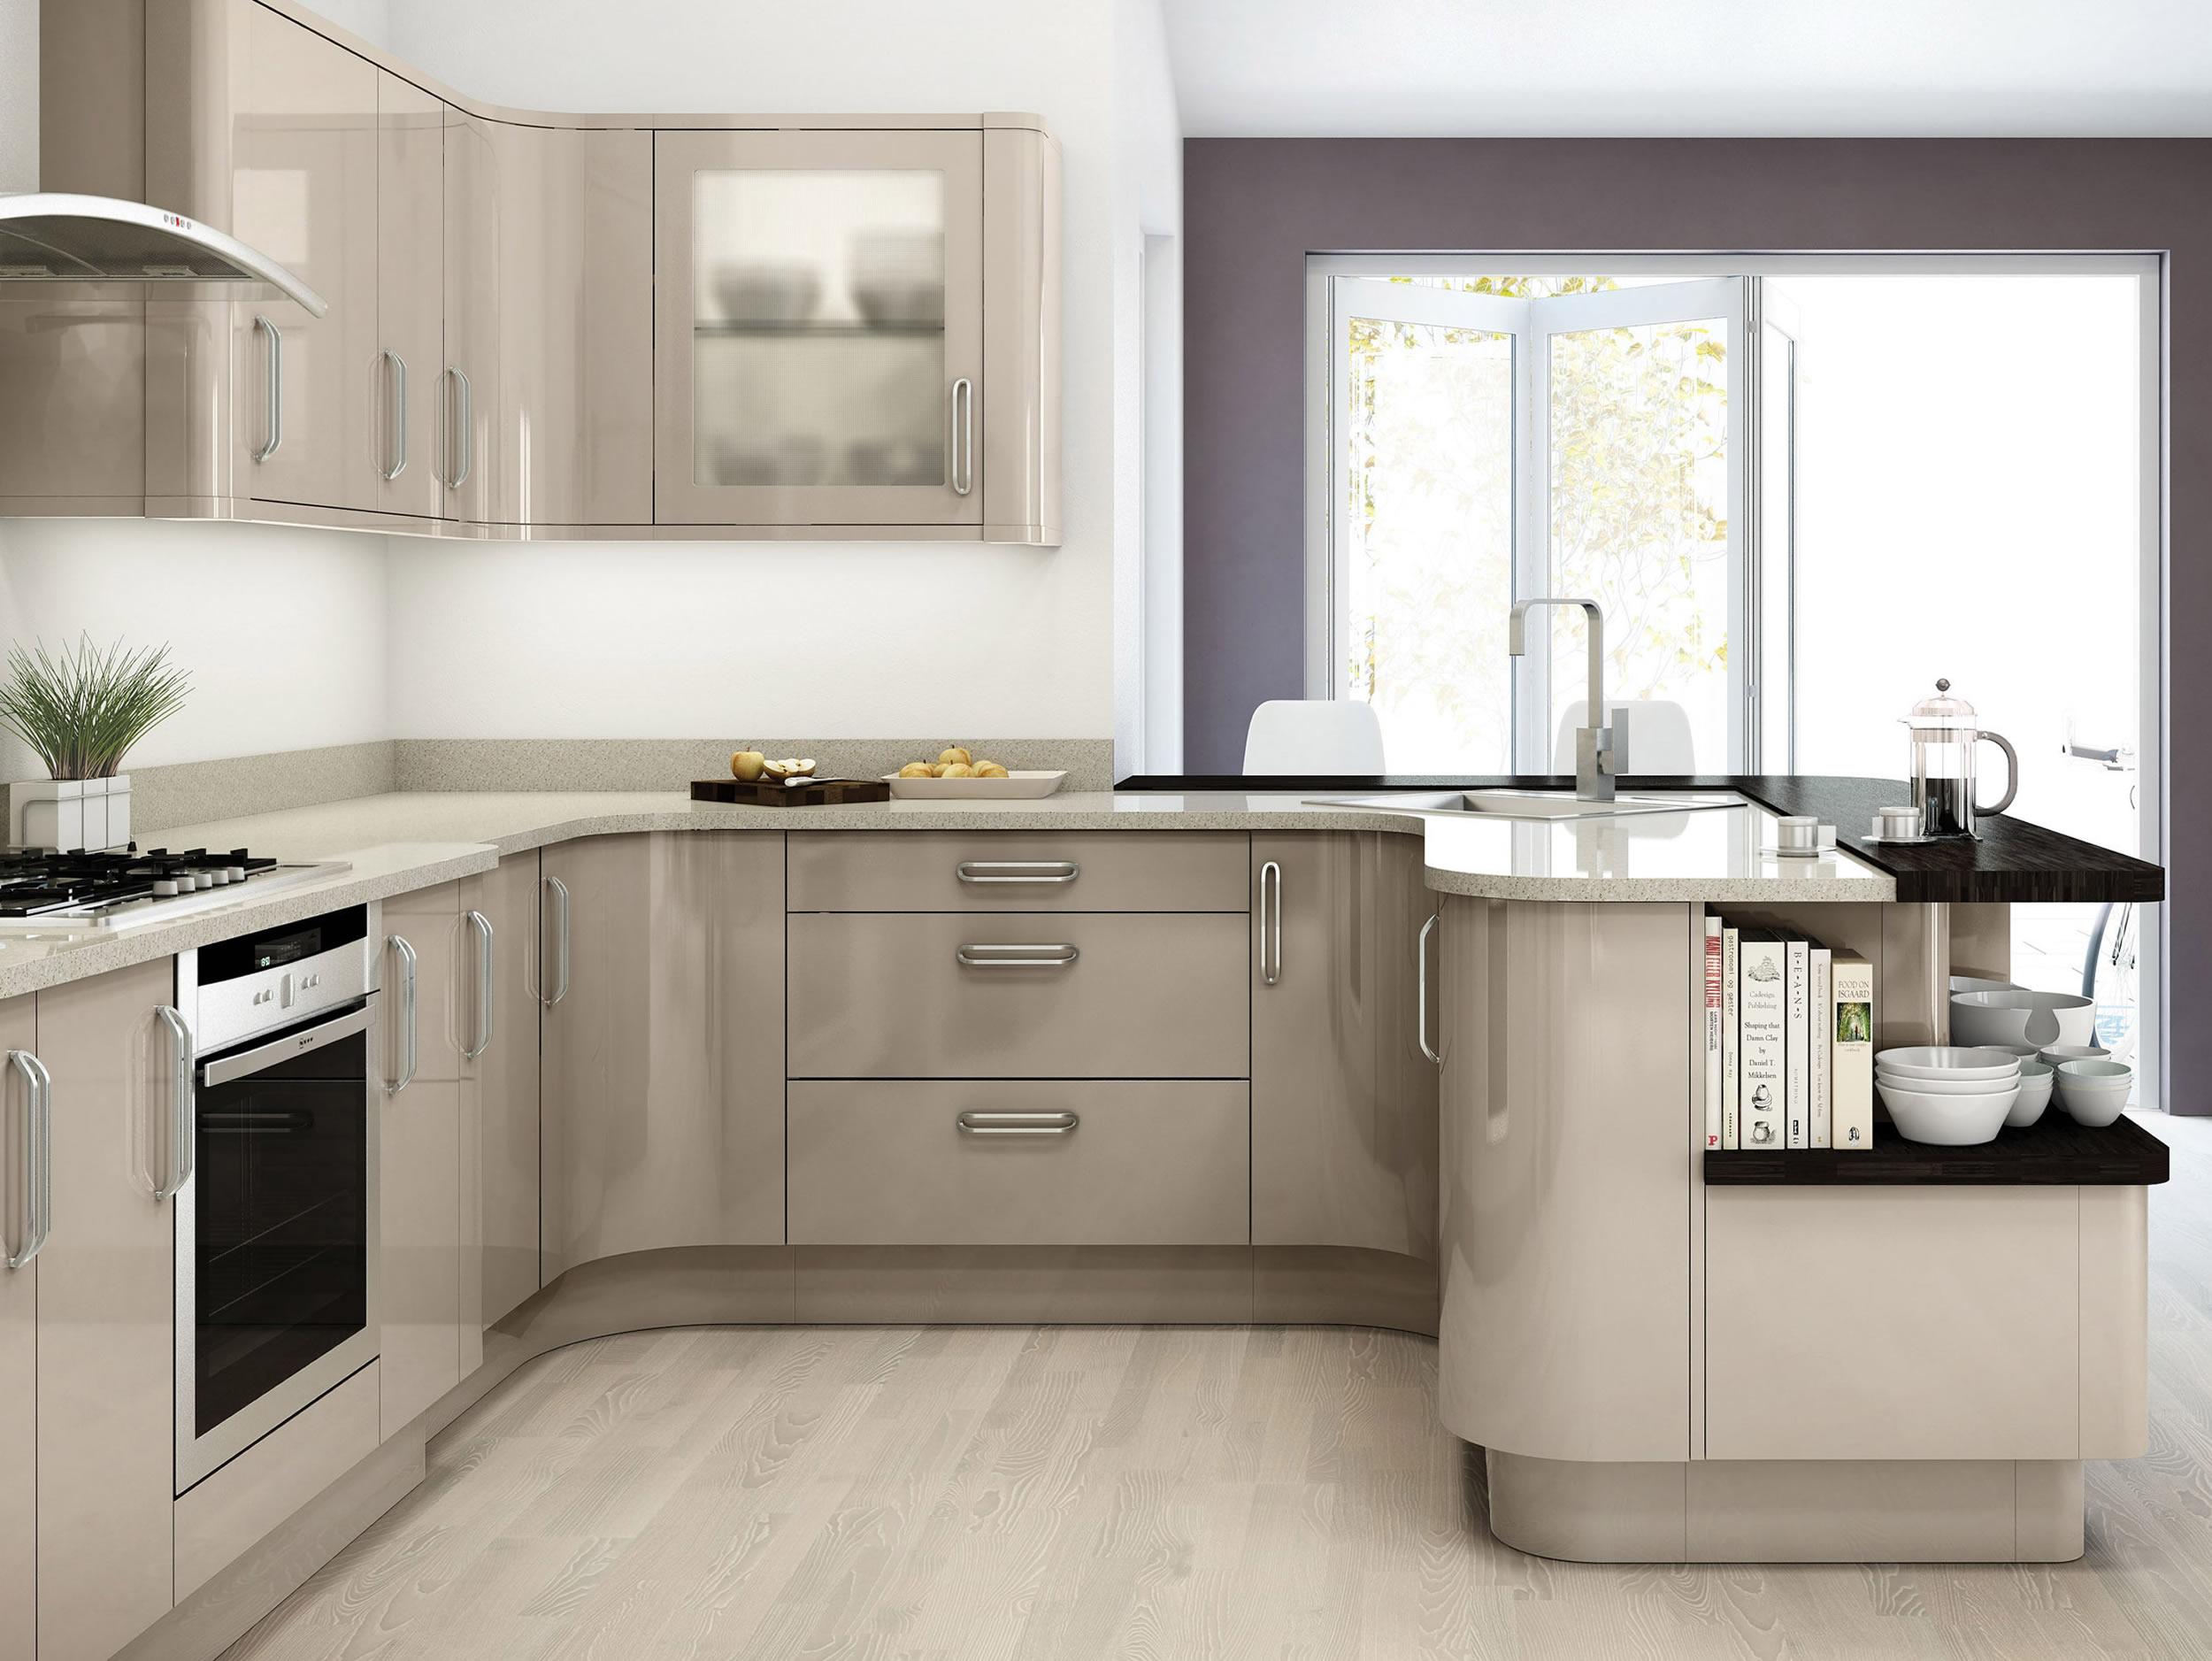 Colored small kitchen appliances Photo - 7